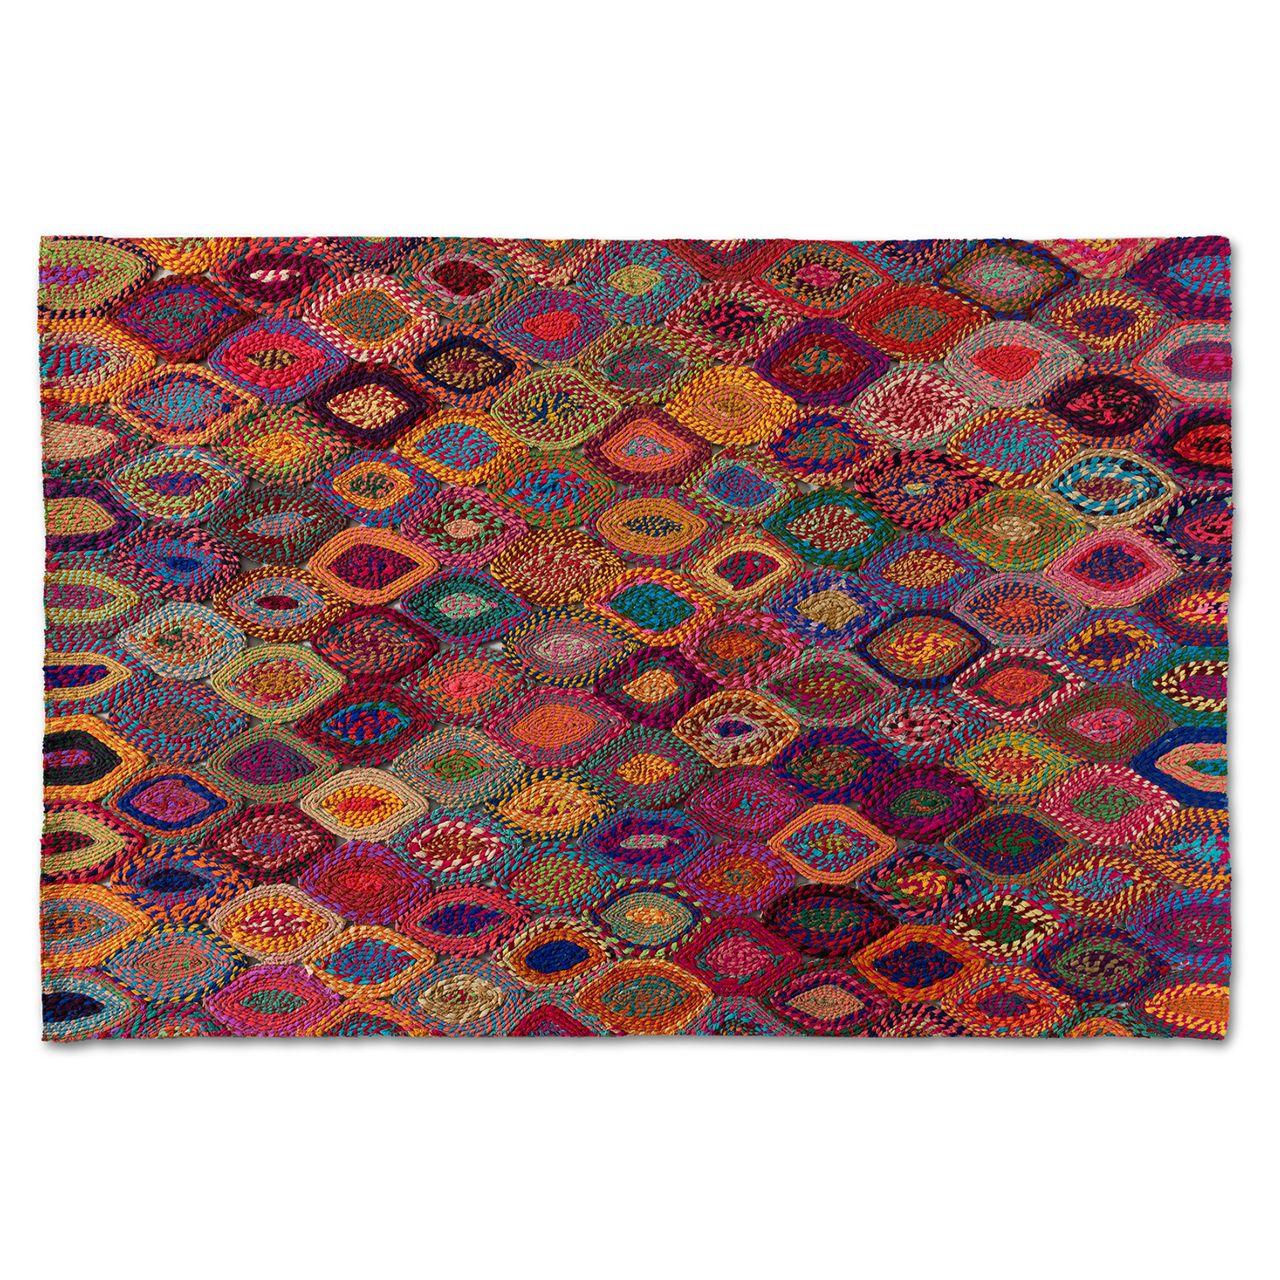 Baxton Studio Addis Multi-Colored Handwoven Fabric Area Rug